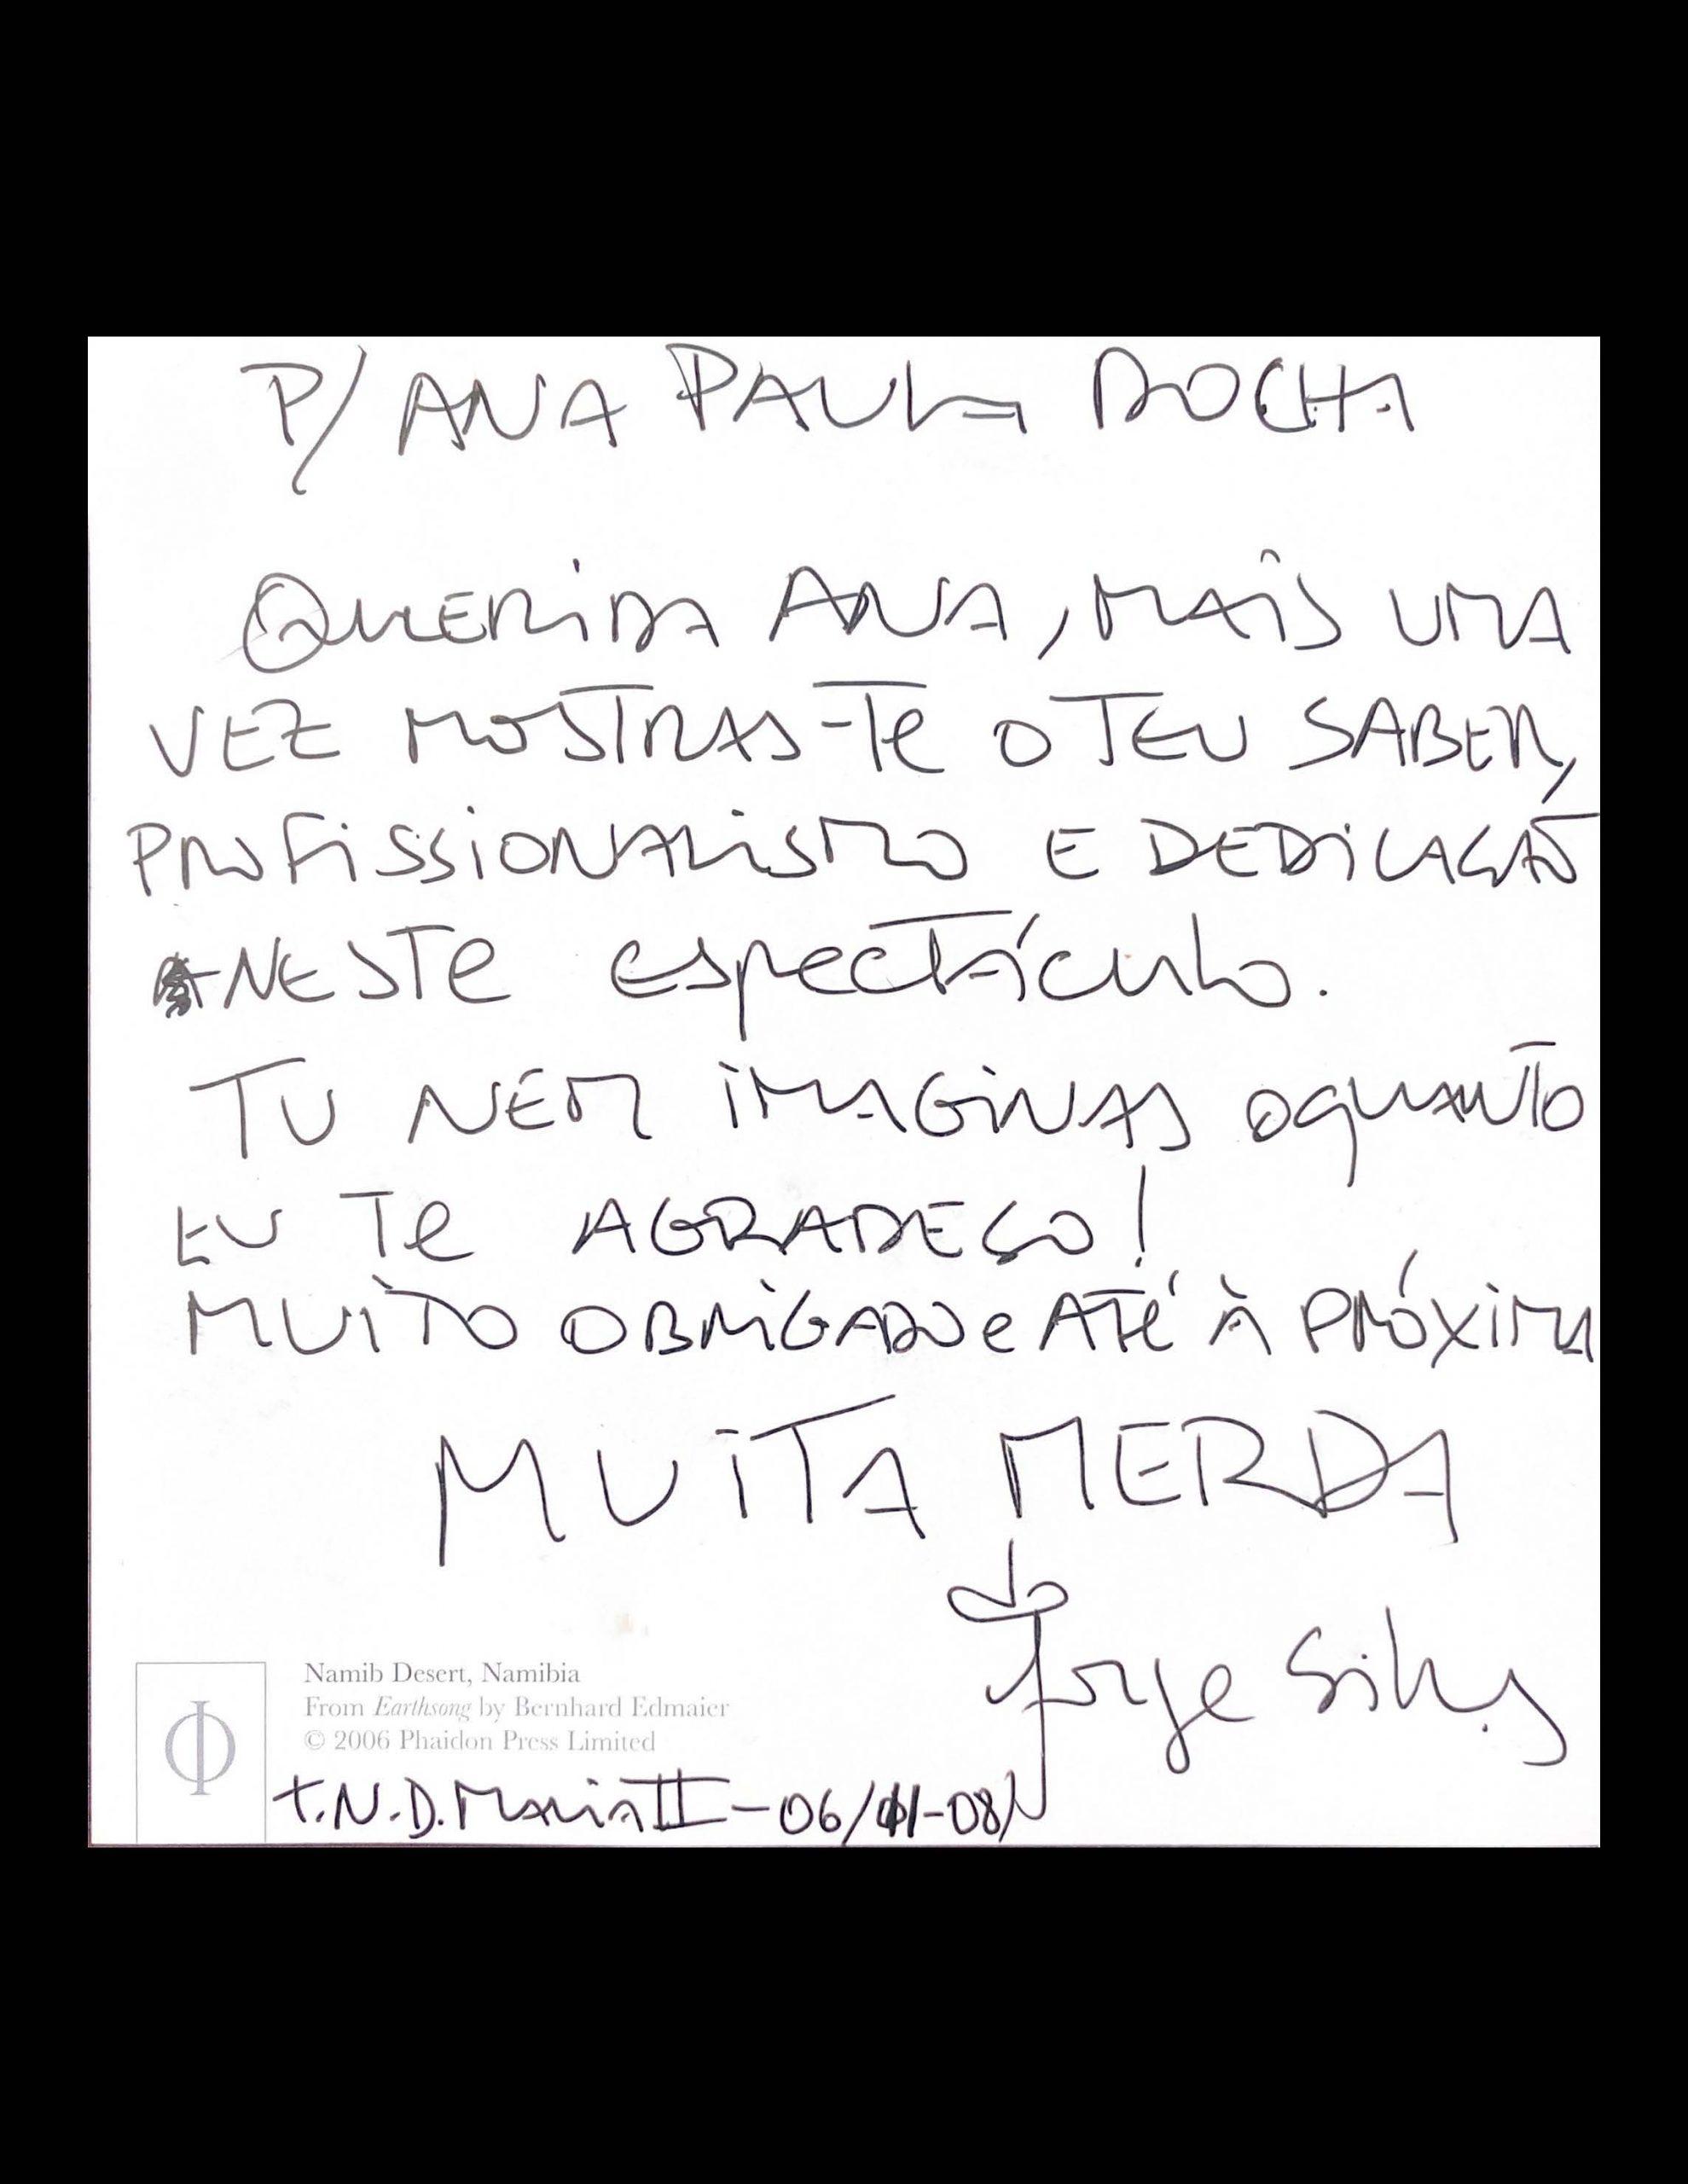 Ana Paula Rocha - Testemunhos - 006